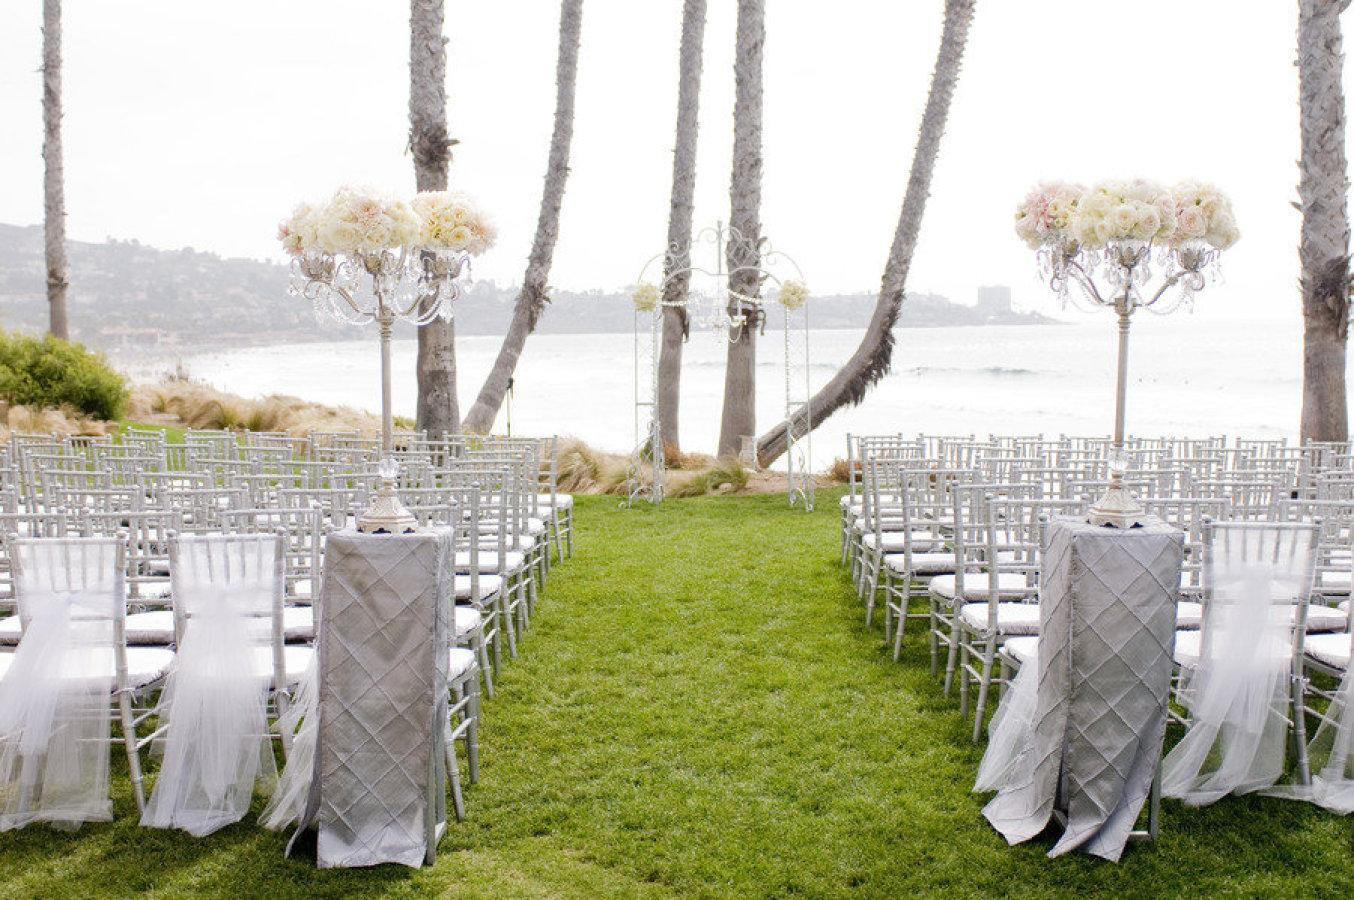 Outdoor Beach Wedding   Casablanca Candelabras with Flowers